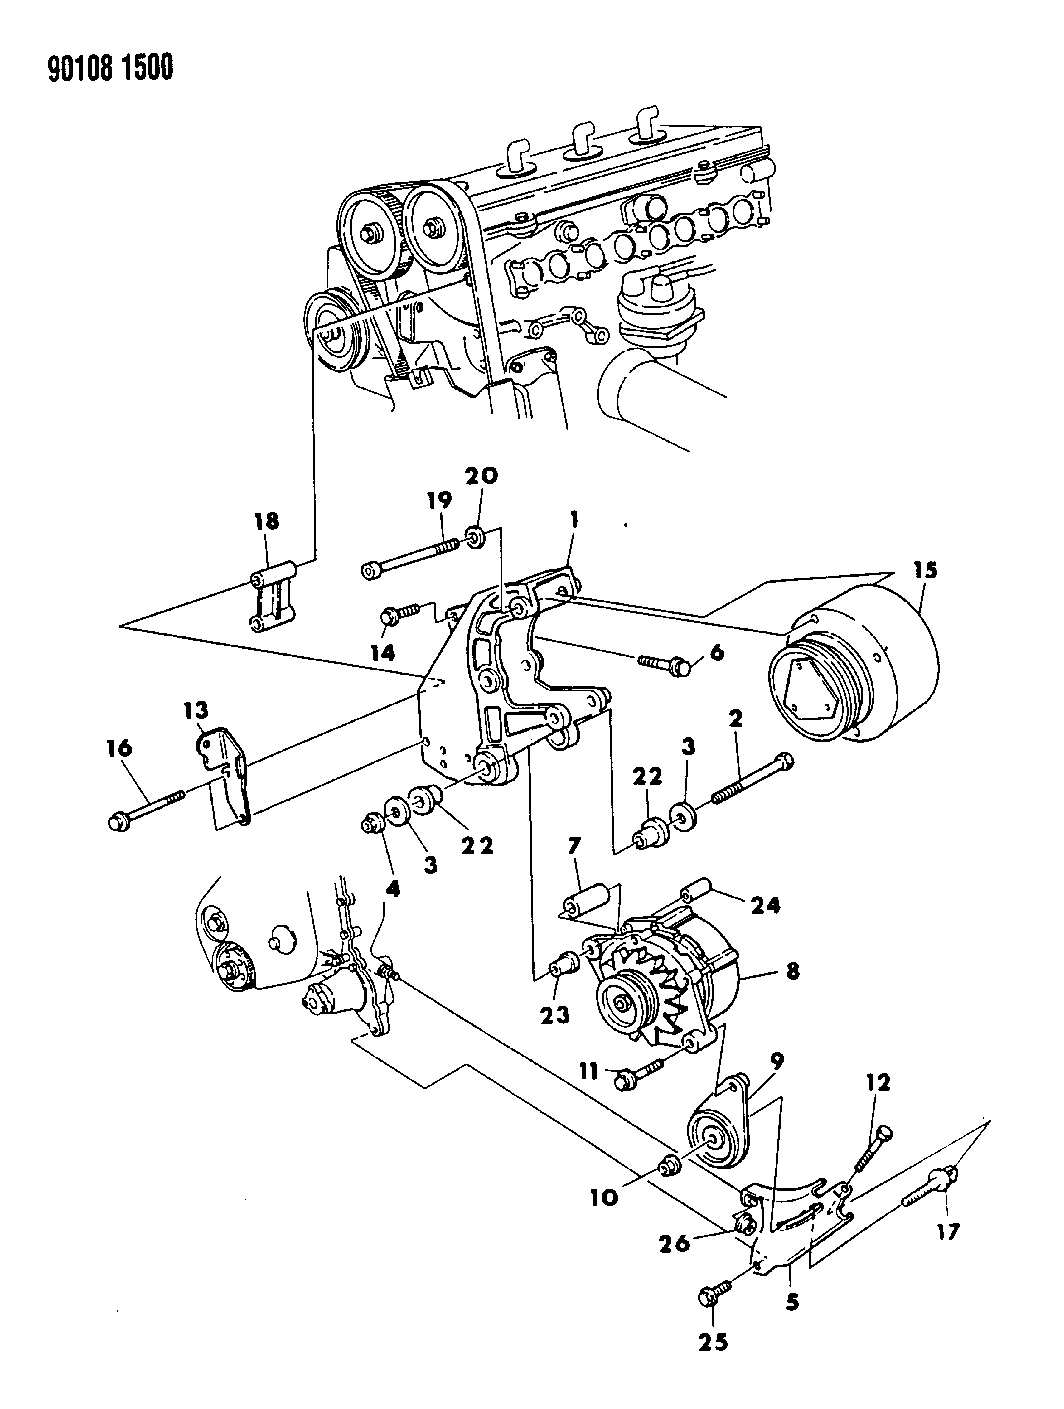 1990 Dodge Dynasty Alternator & Mounting - Thumbnail 3